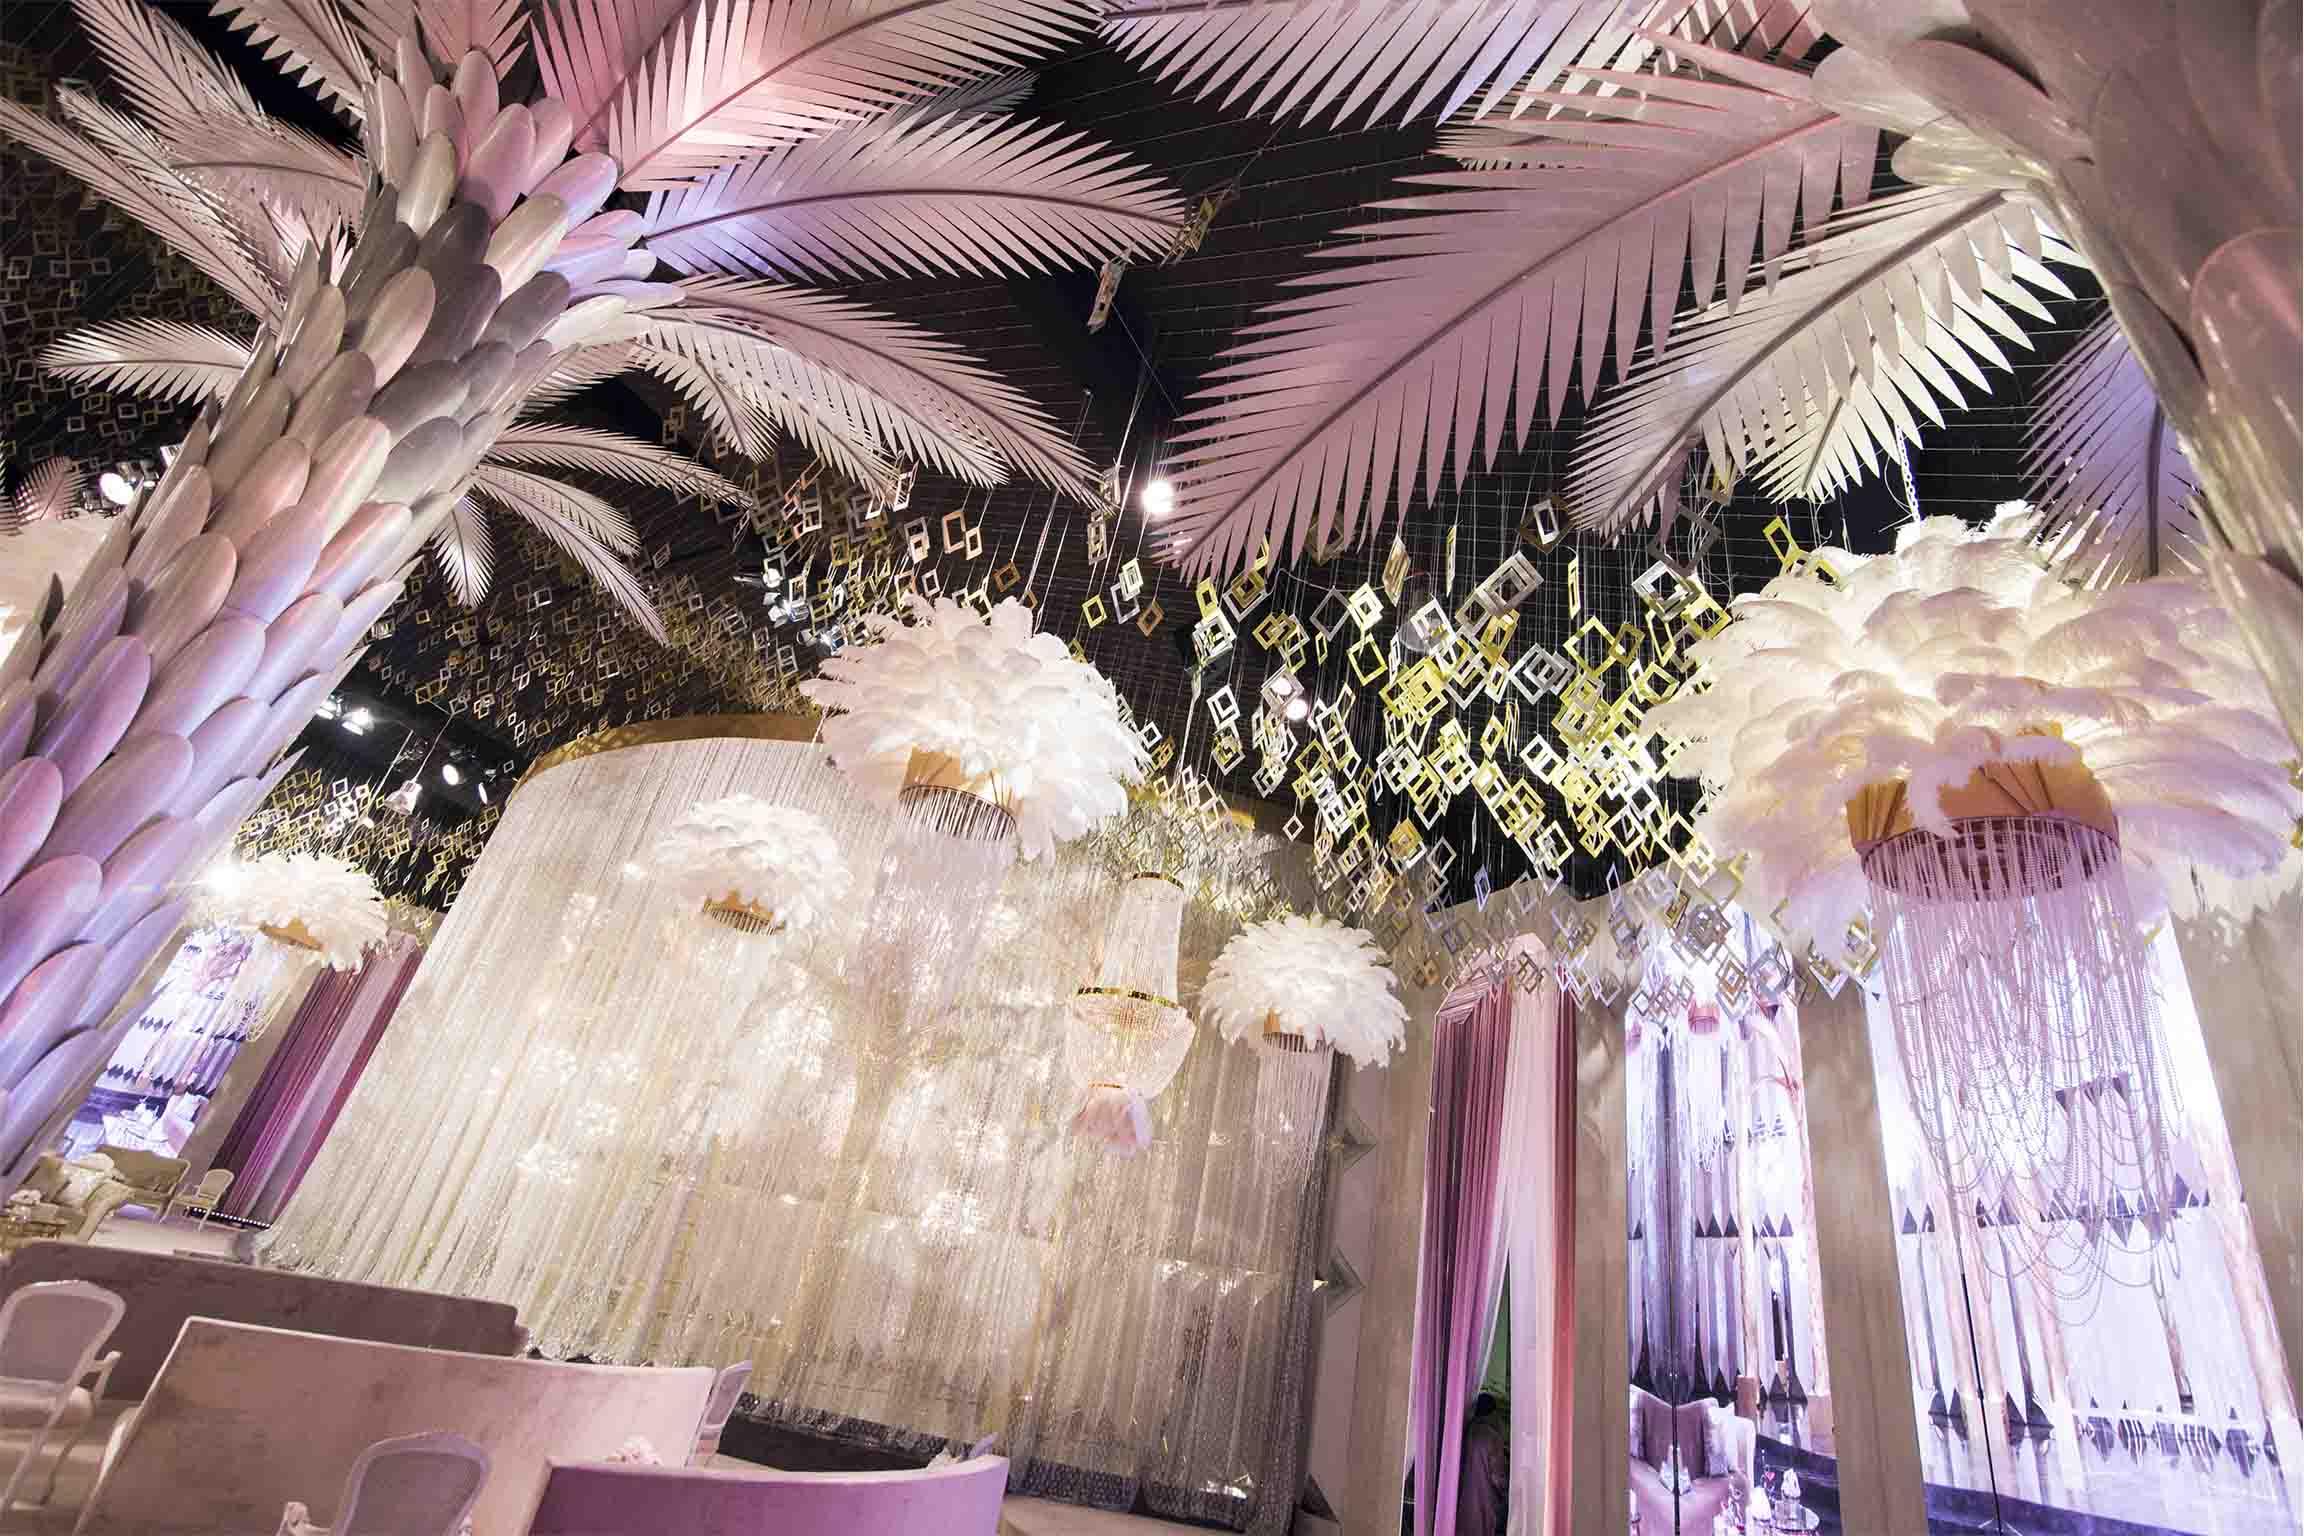 WEDDING - DATE: DECEMBER, 2017LOCATION: RIYADH, KSANUMBER OF GUESTS: 500